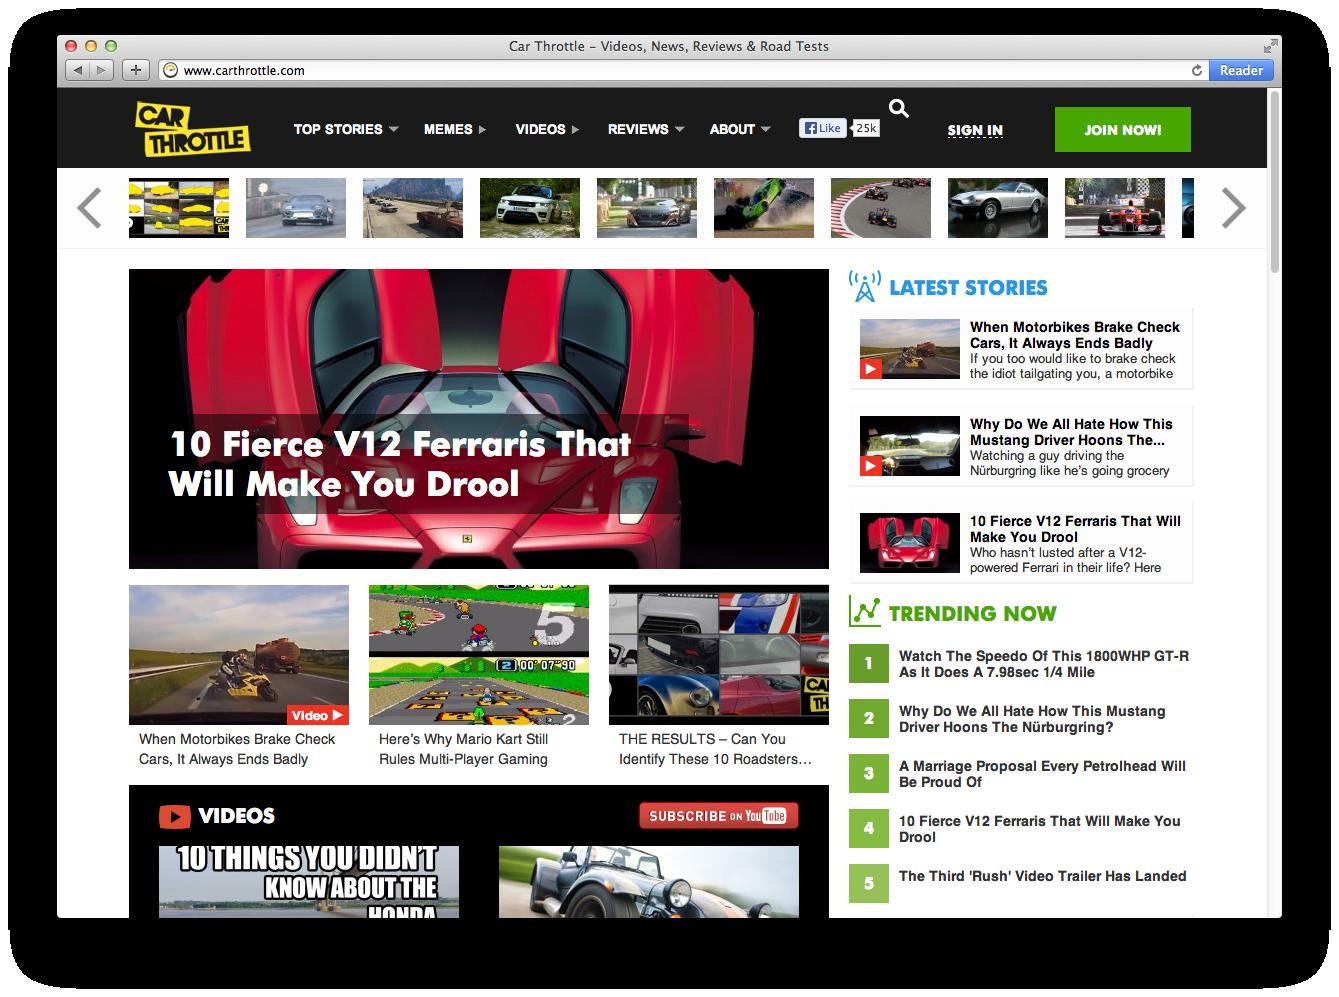 gosquared car throttle api real-time analytics - gosquared blog